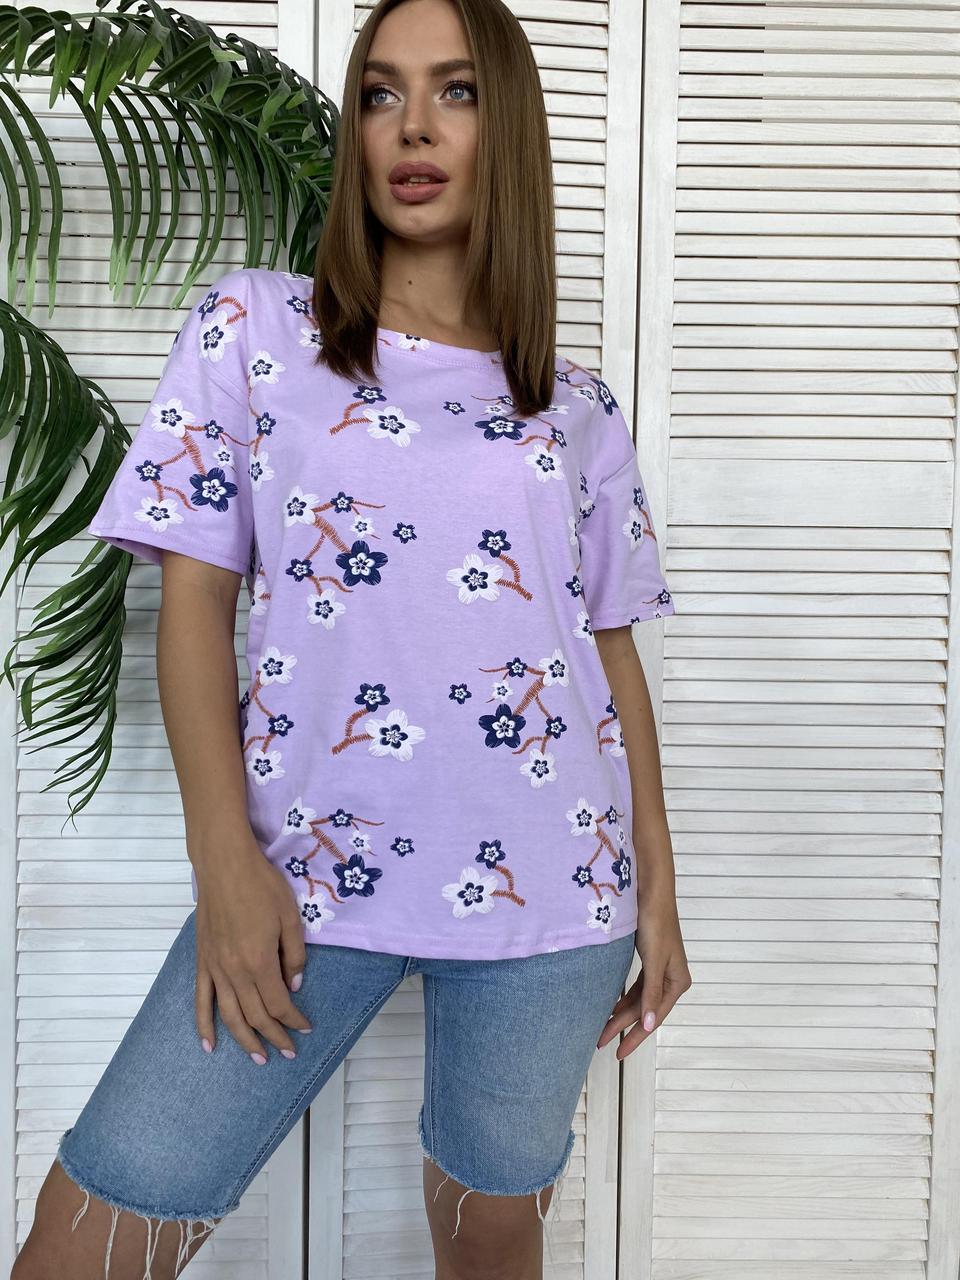 Сиреневая женская футболка 48-52рр.